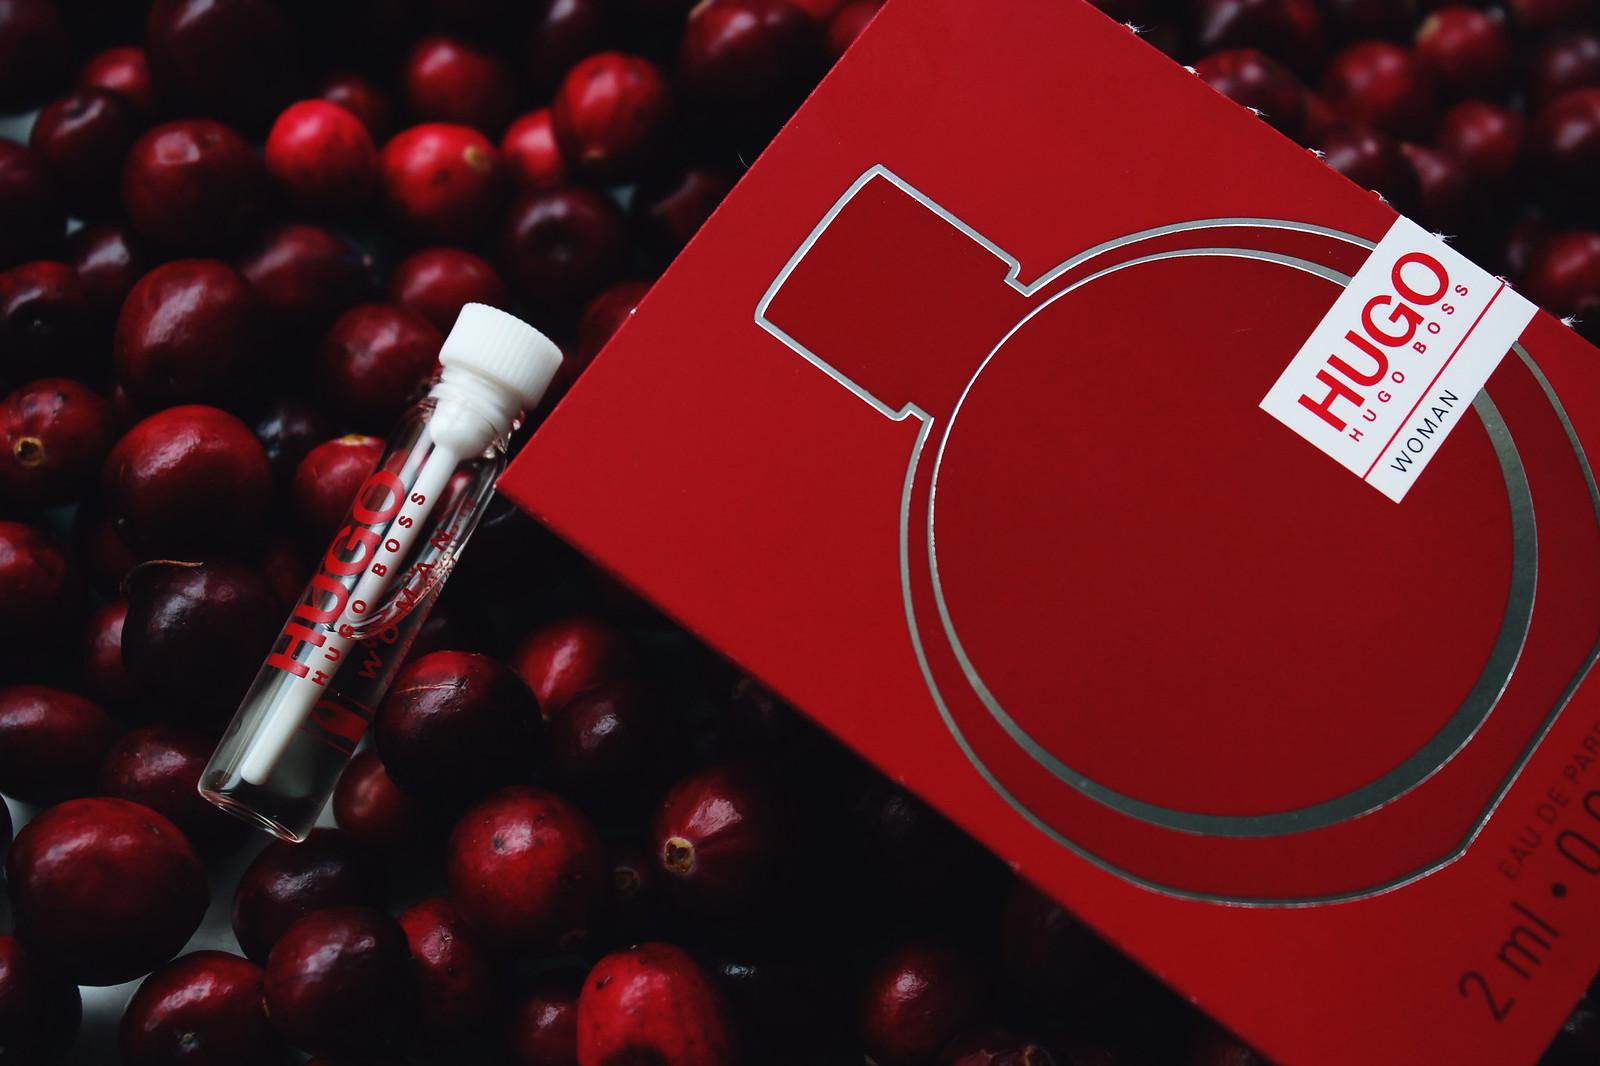 Hugo Boss Women perfume review